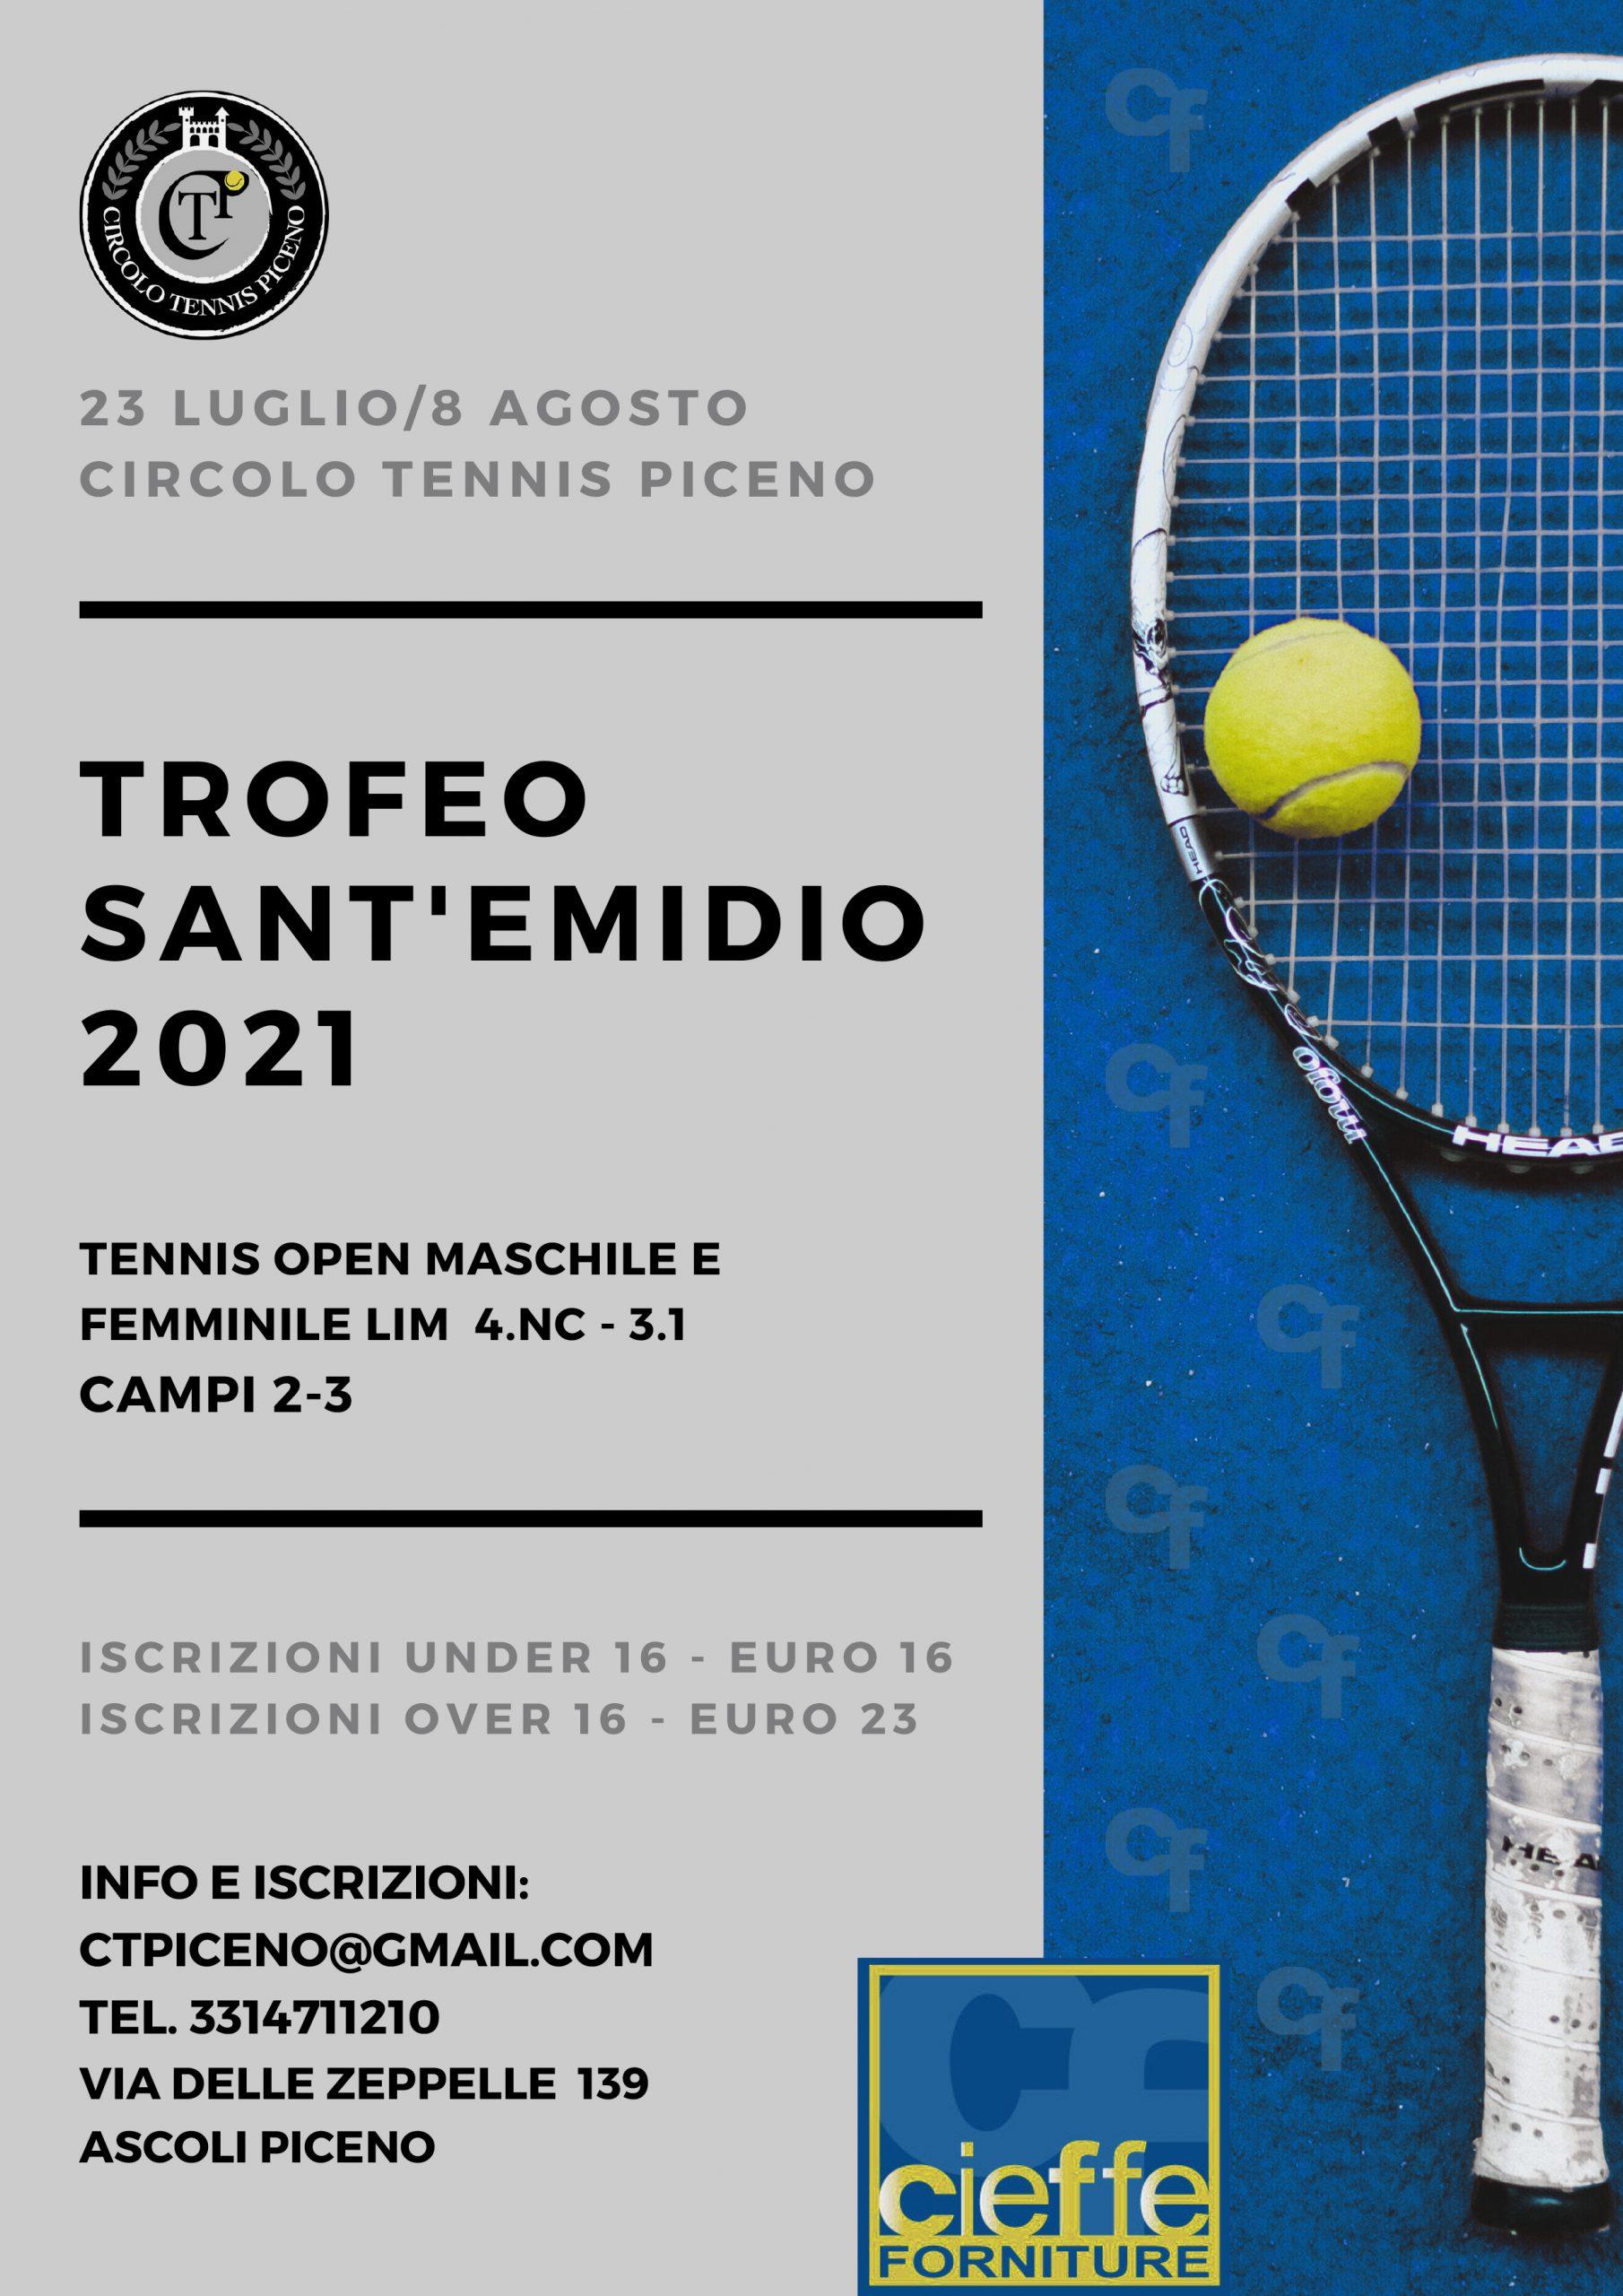 tROFEO SANT'EMIDIO 2021